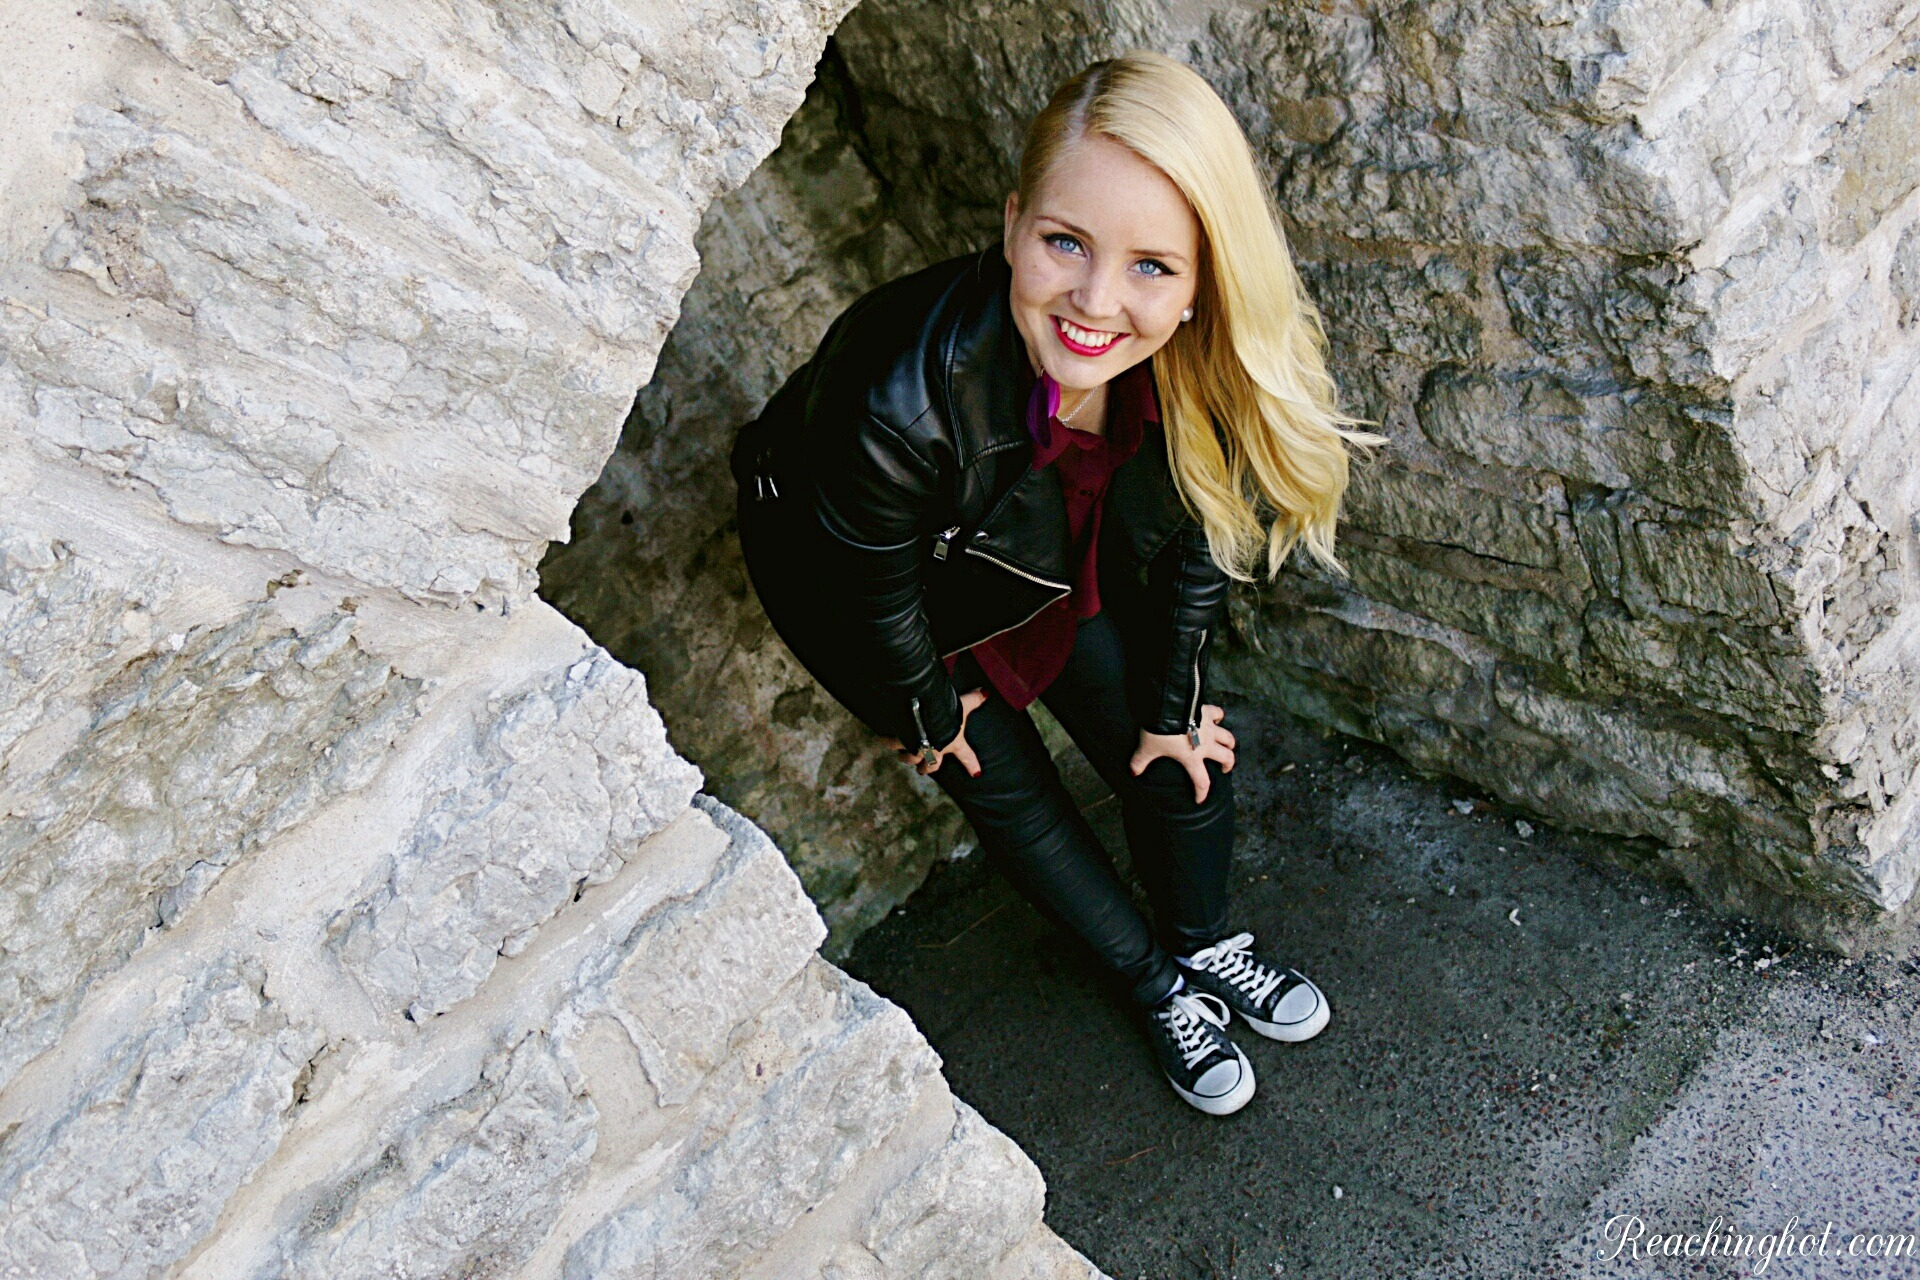 Reachinghot travel blogger in Tallin, Estonia